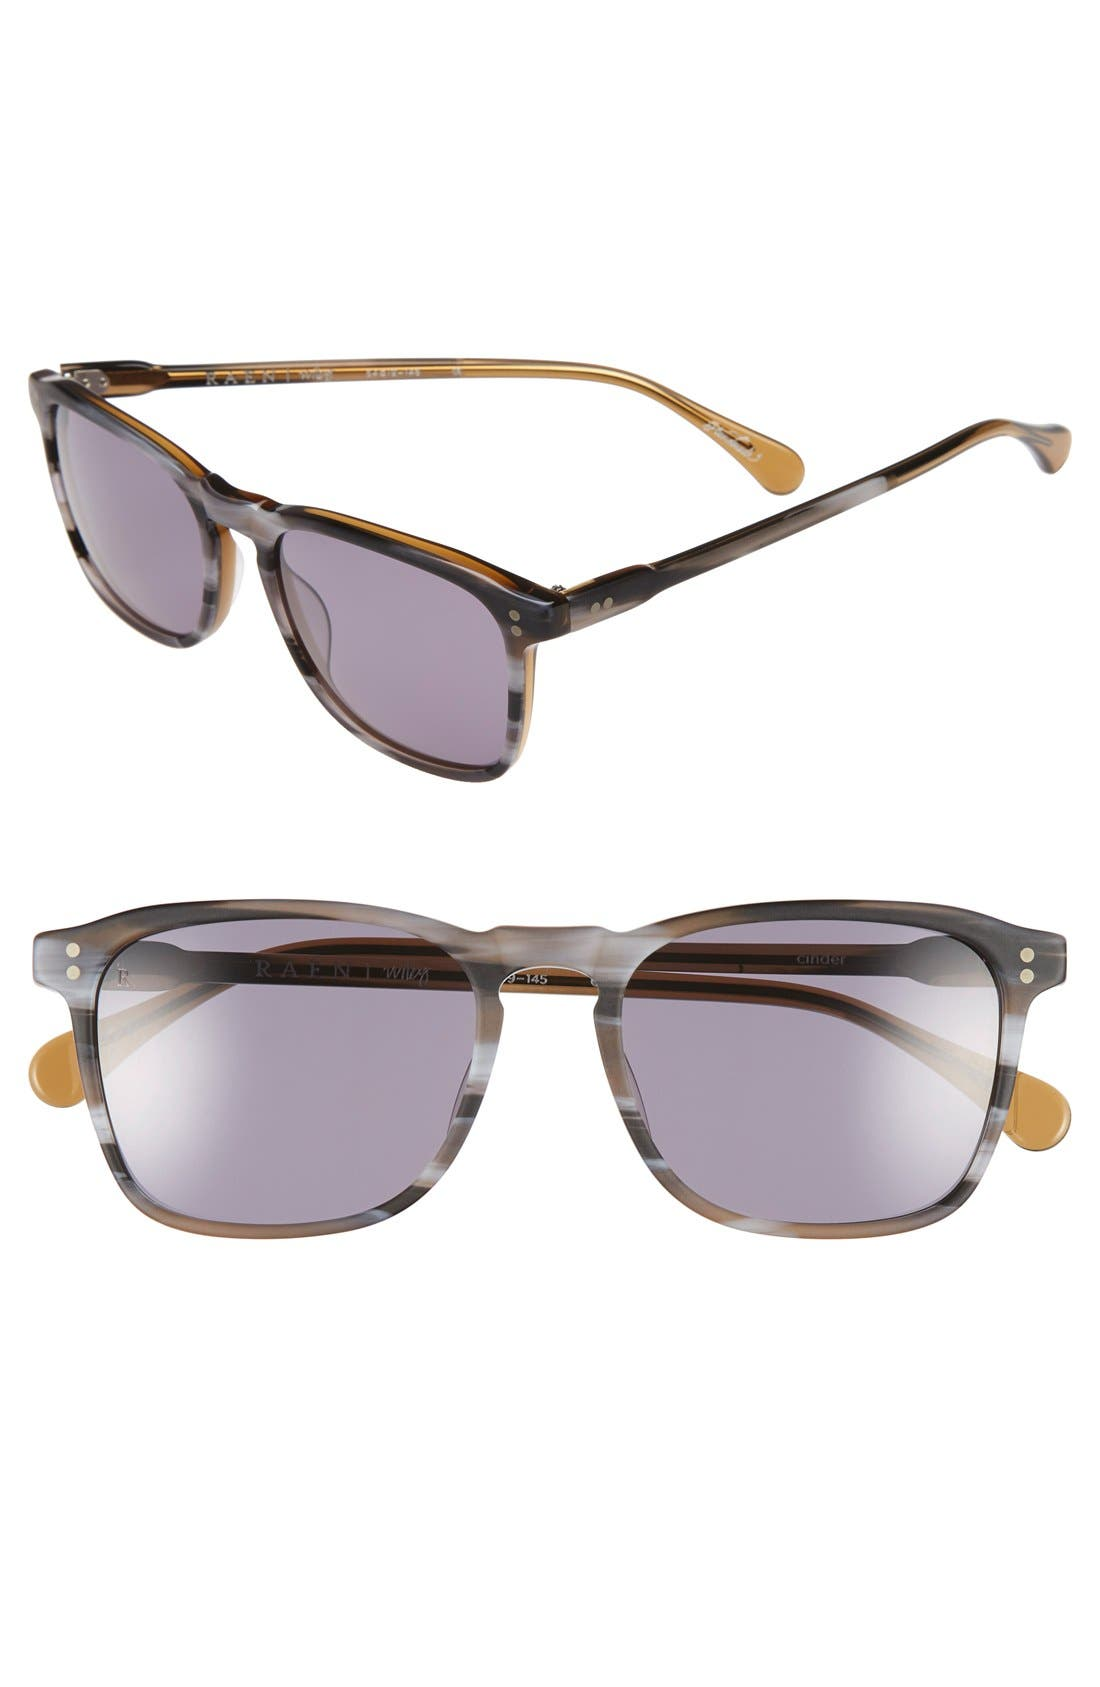 Alternate Image 1 Selected - RAEN 'Wiley' 54mm Sunglasses